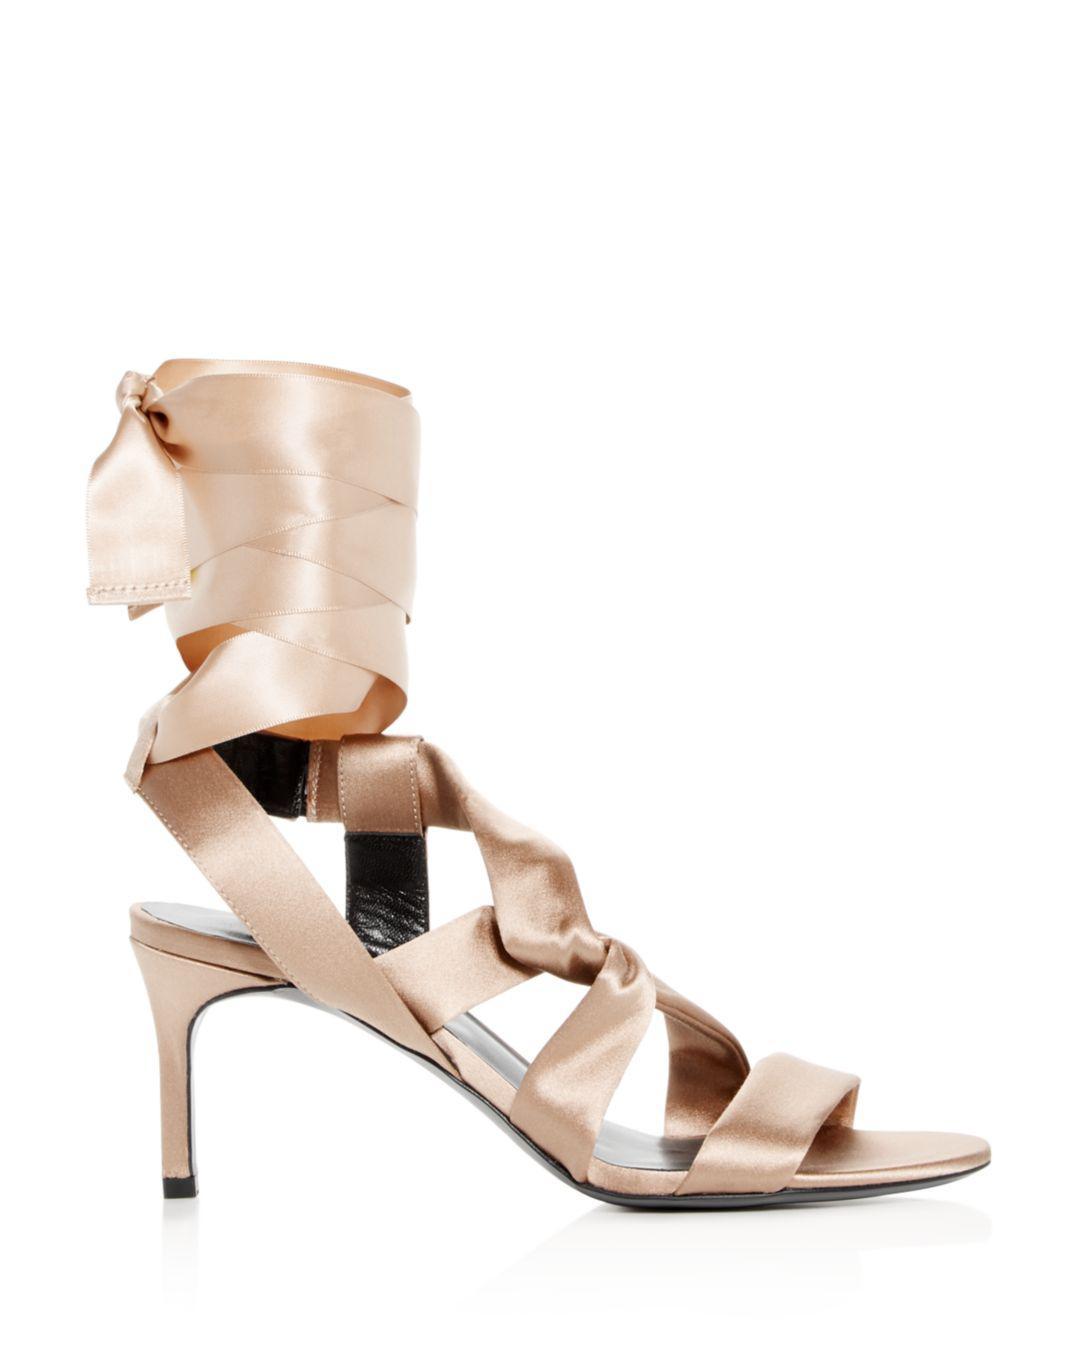 8694bc9eb7a9 Lyst - Via Spiga Women s Jett Ankle Tie High-heel Sandals